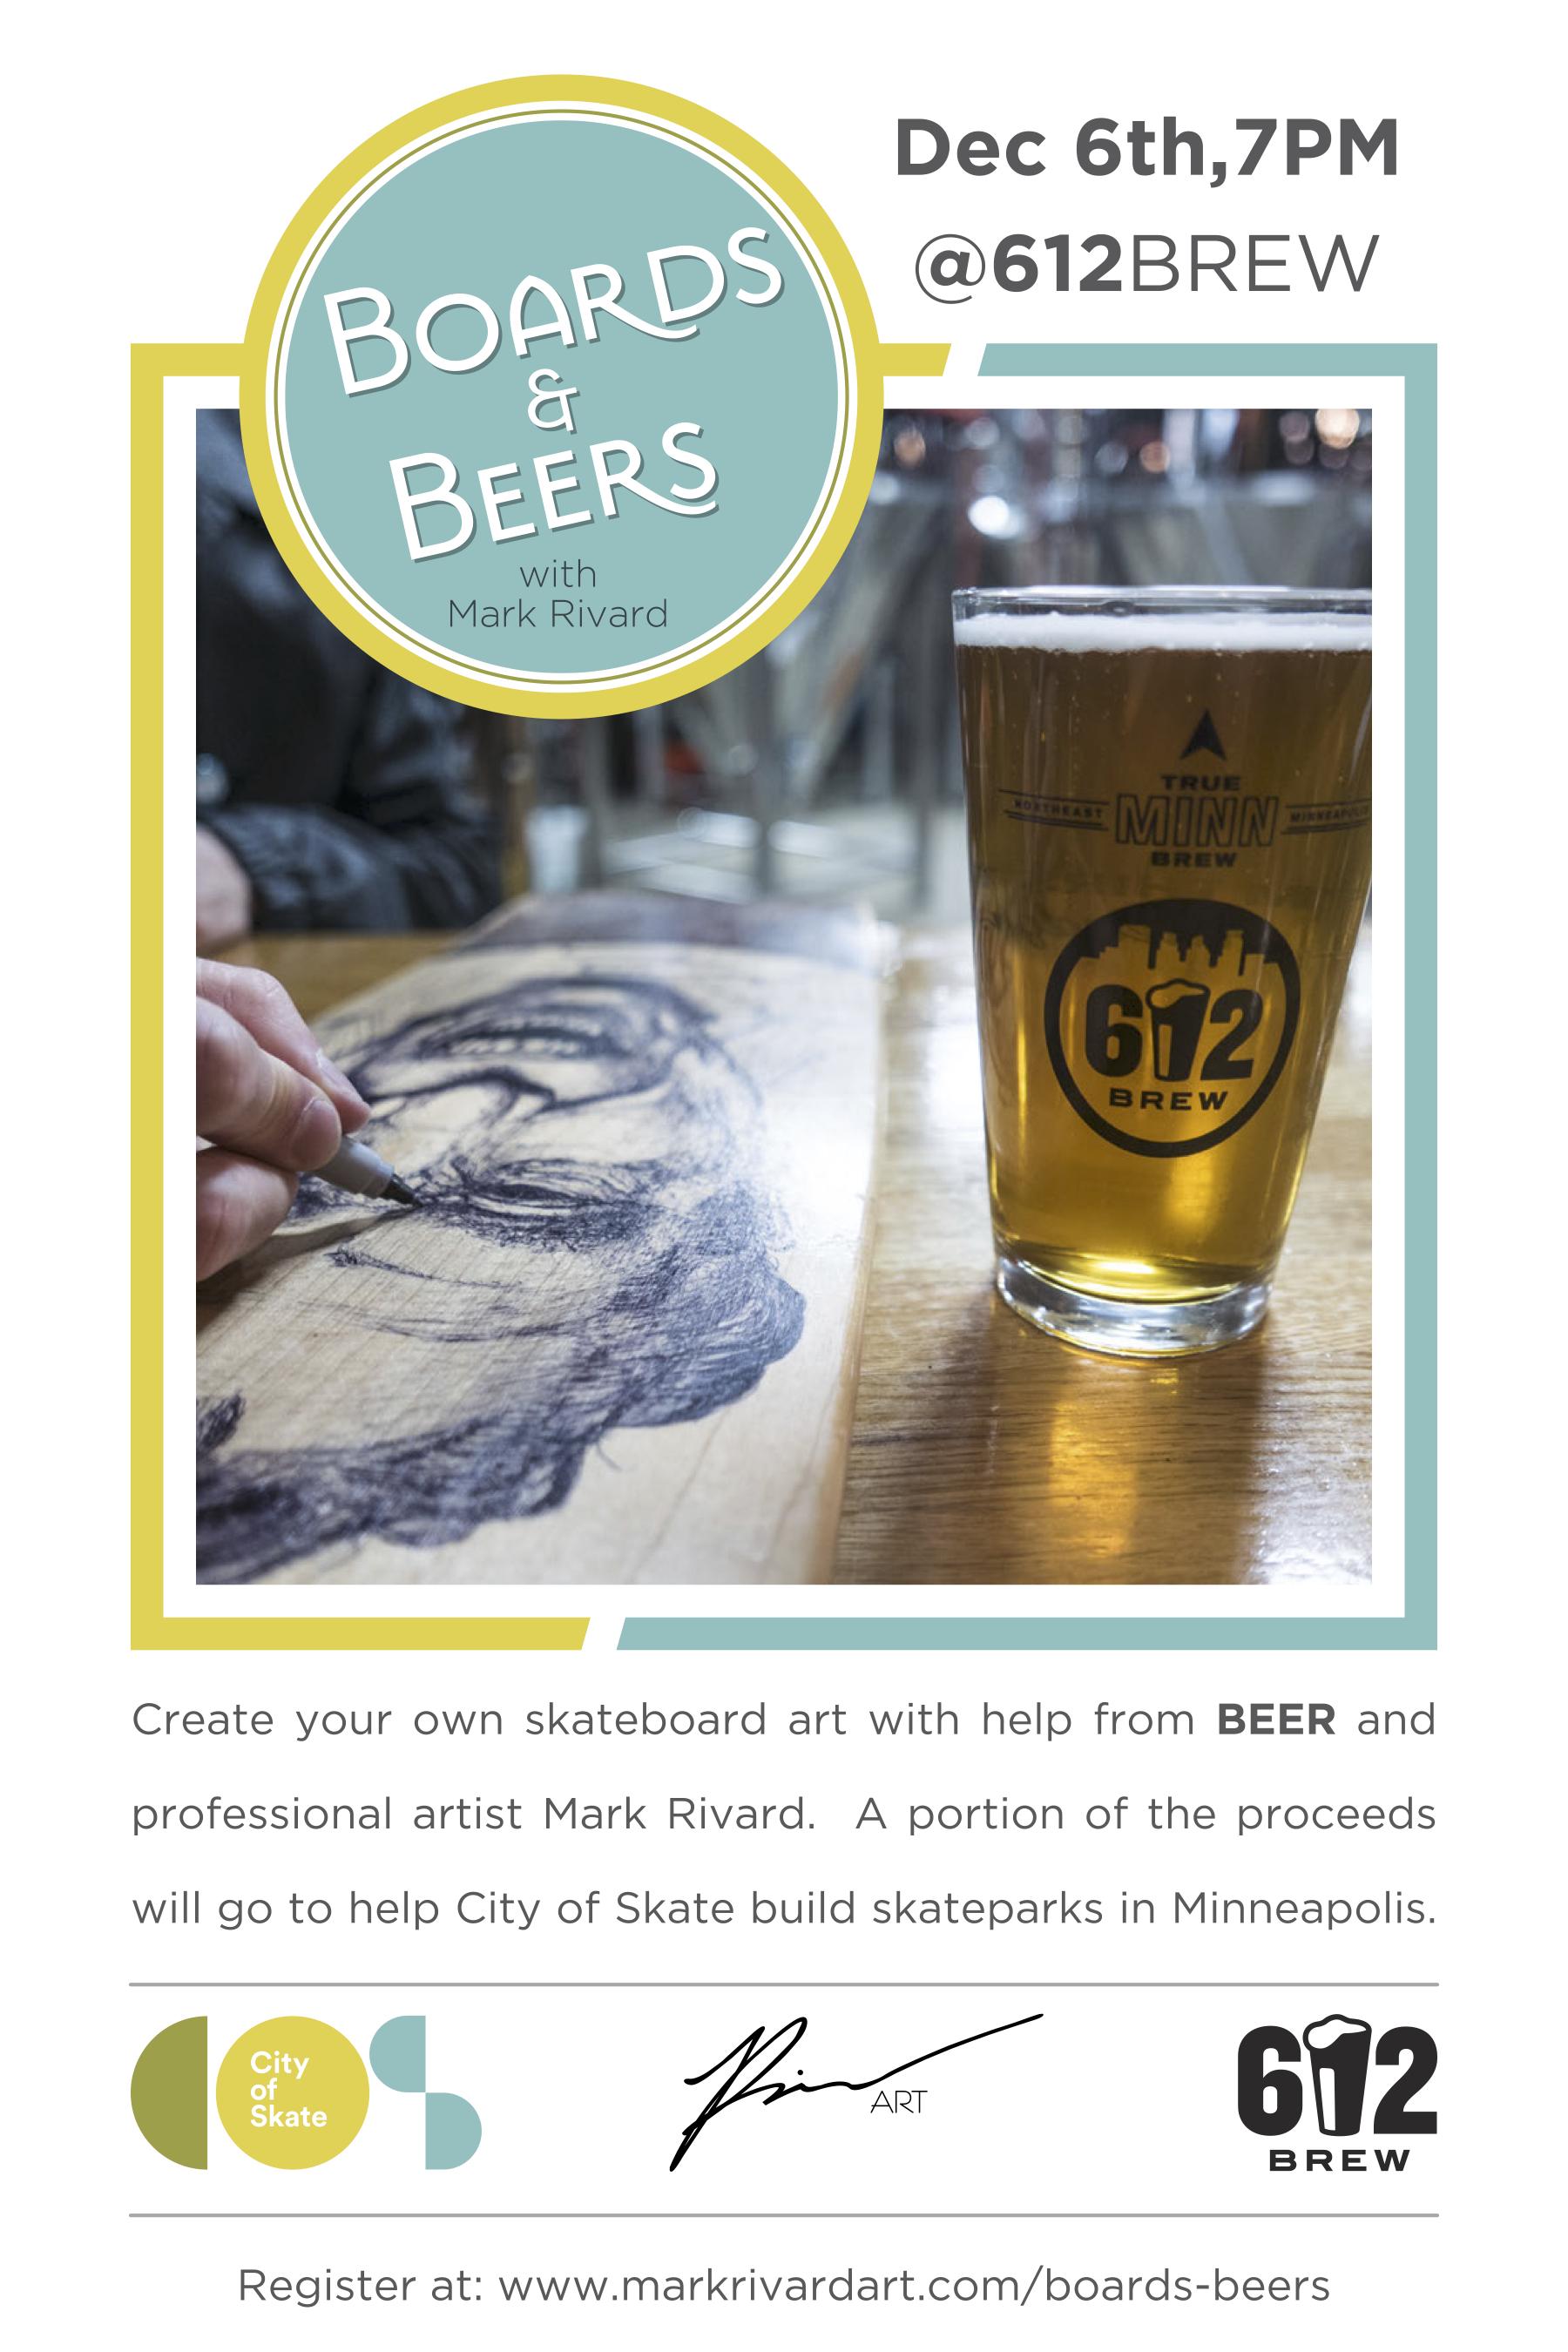 Board and Beers Low Res JPEG.jpg